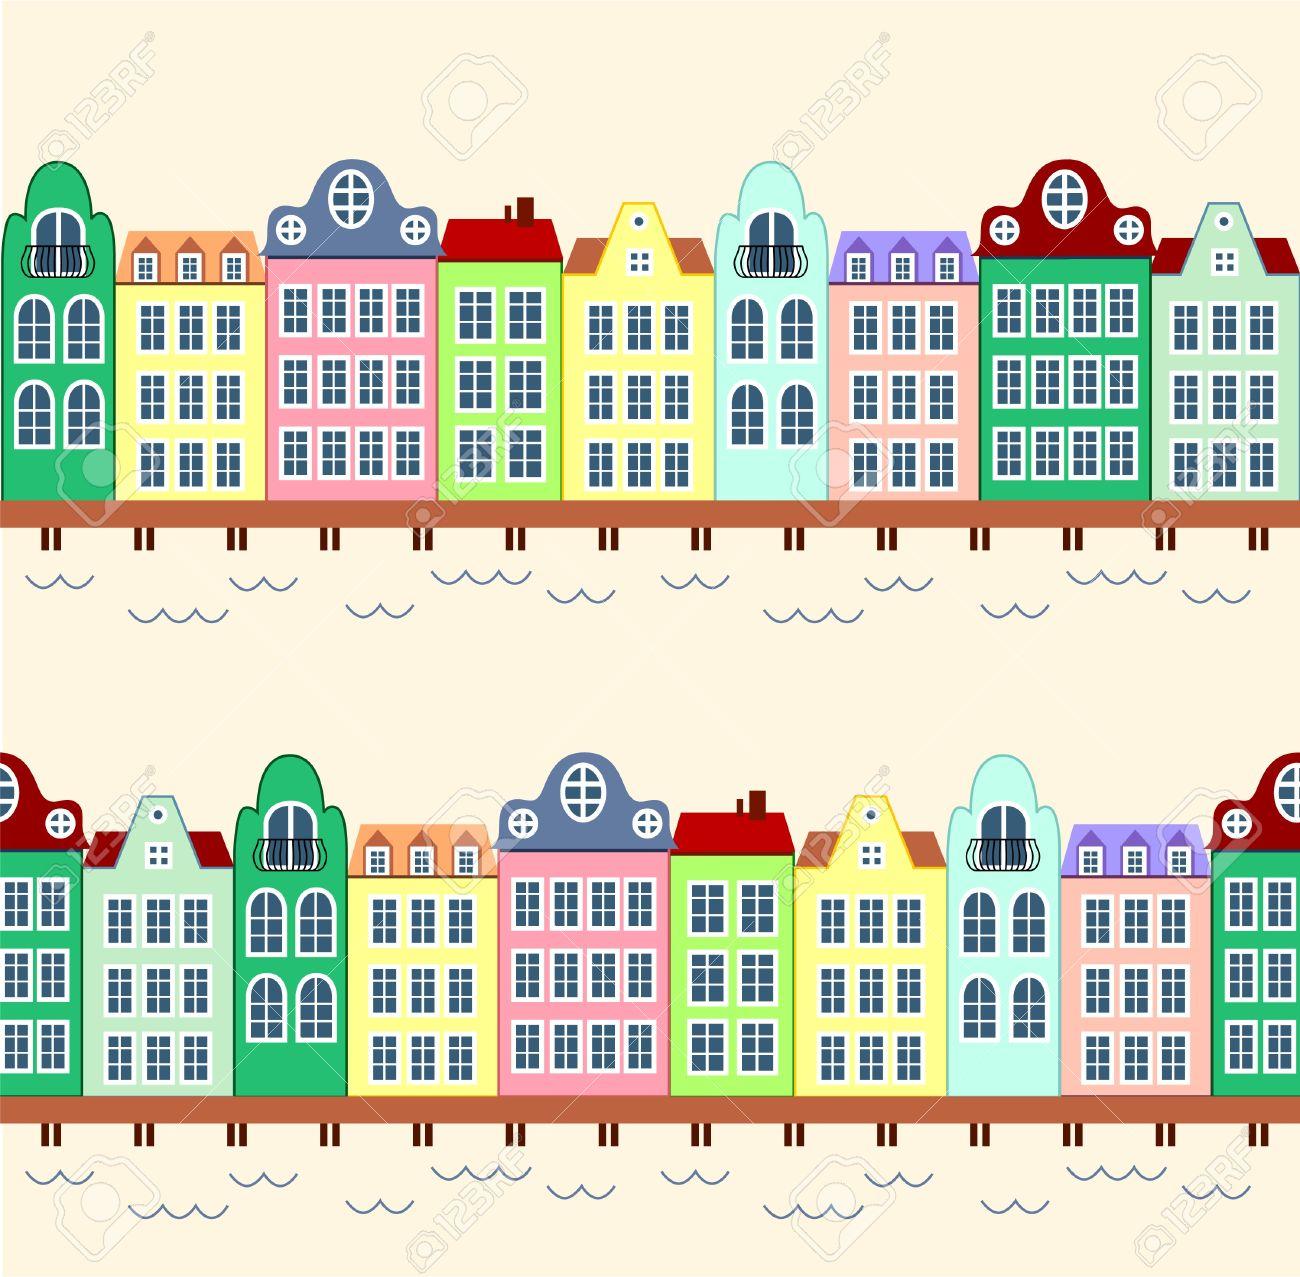 Row of shops clipart vector library Row house clipart - ClipartFest vector library